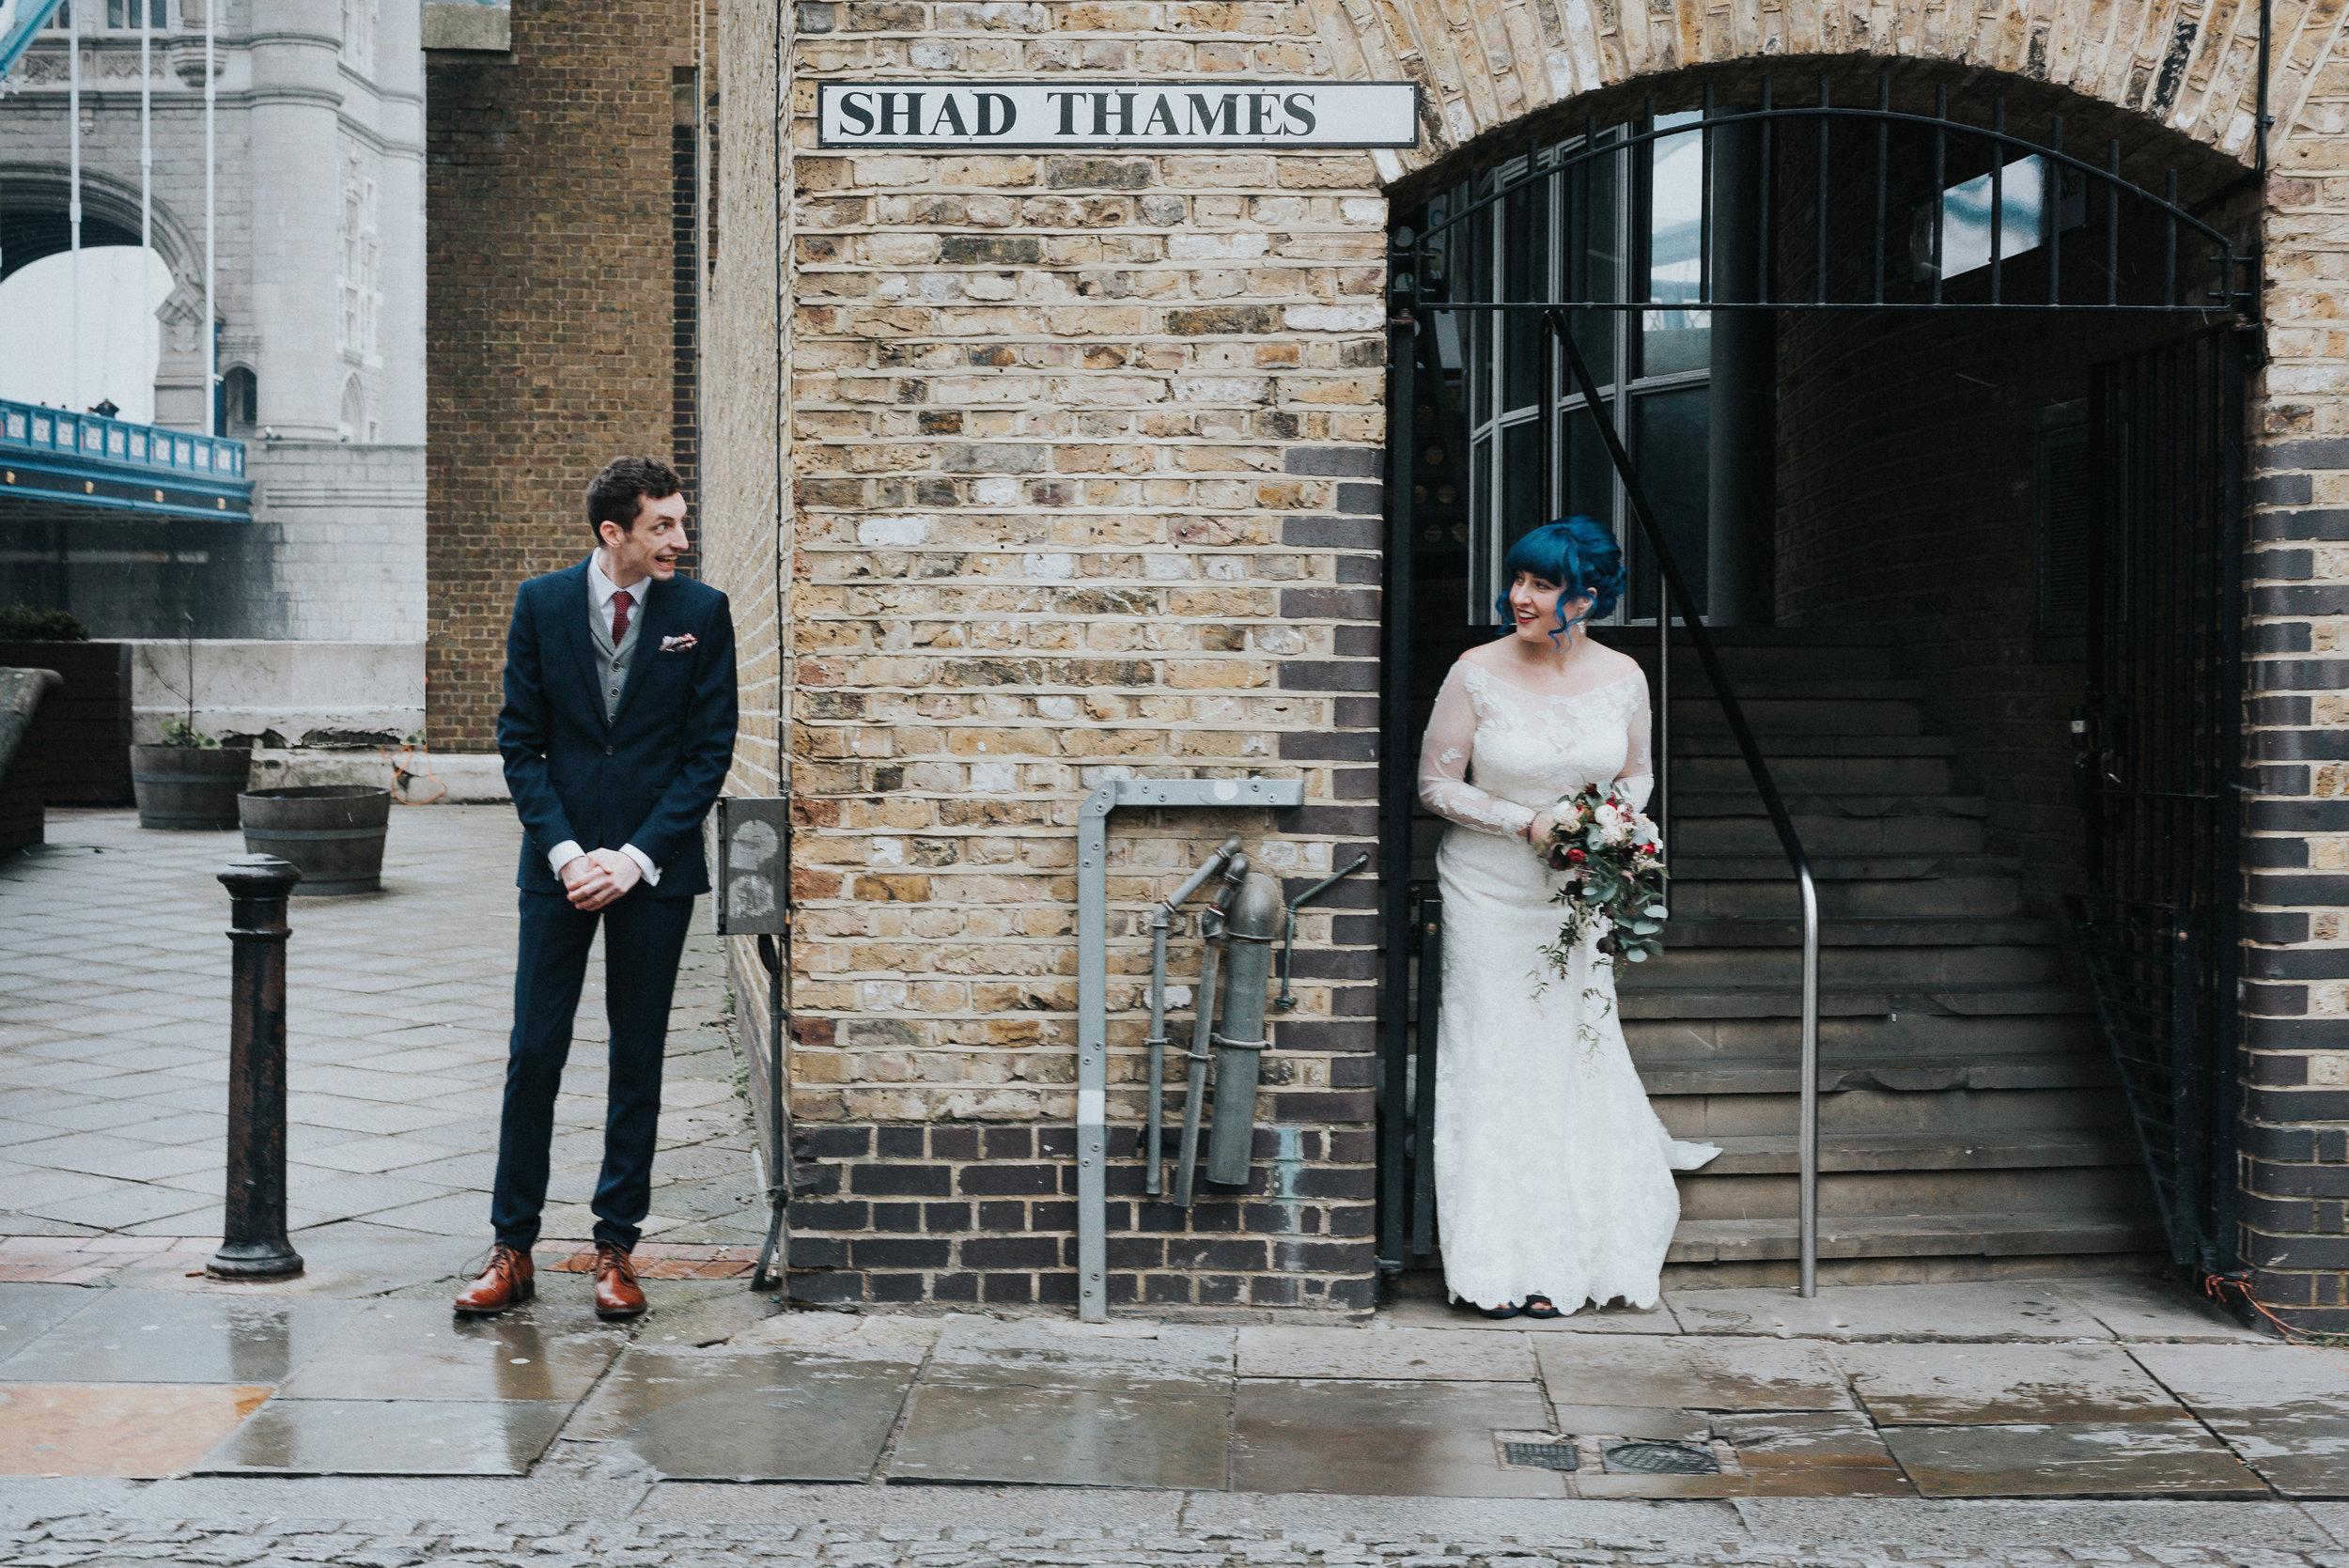 London-Chic-Alternative-Wedding-Jay-Tunbridge-Photographic-Co-5.jpg